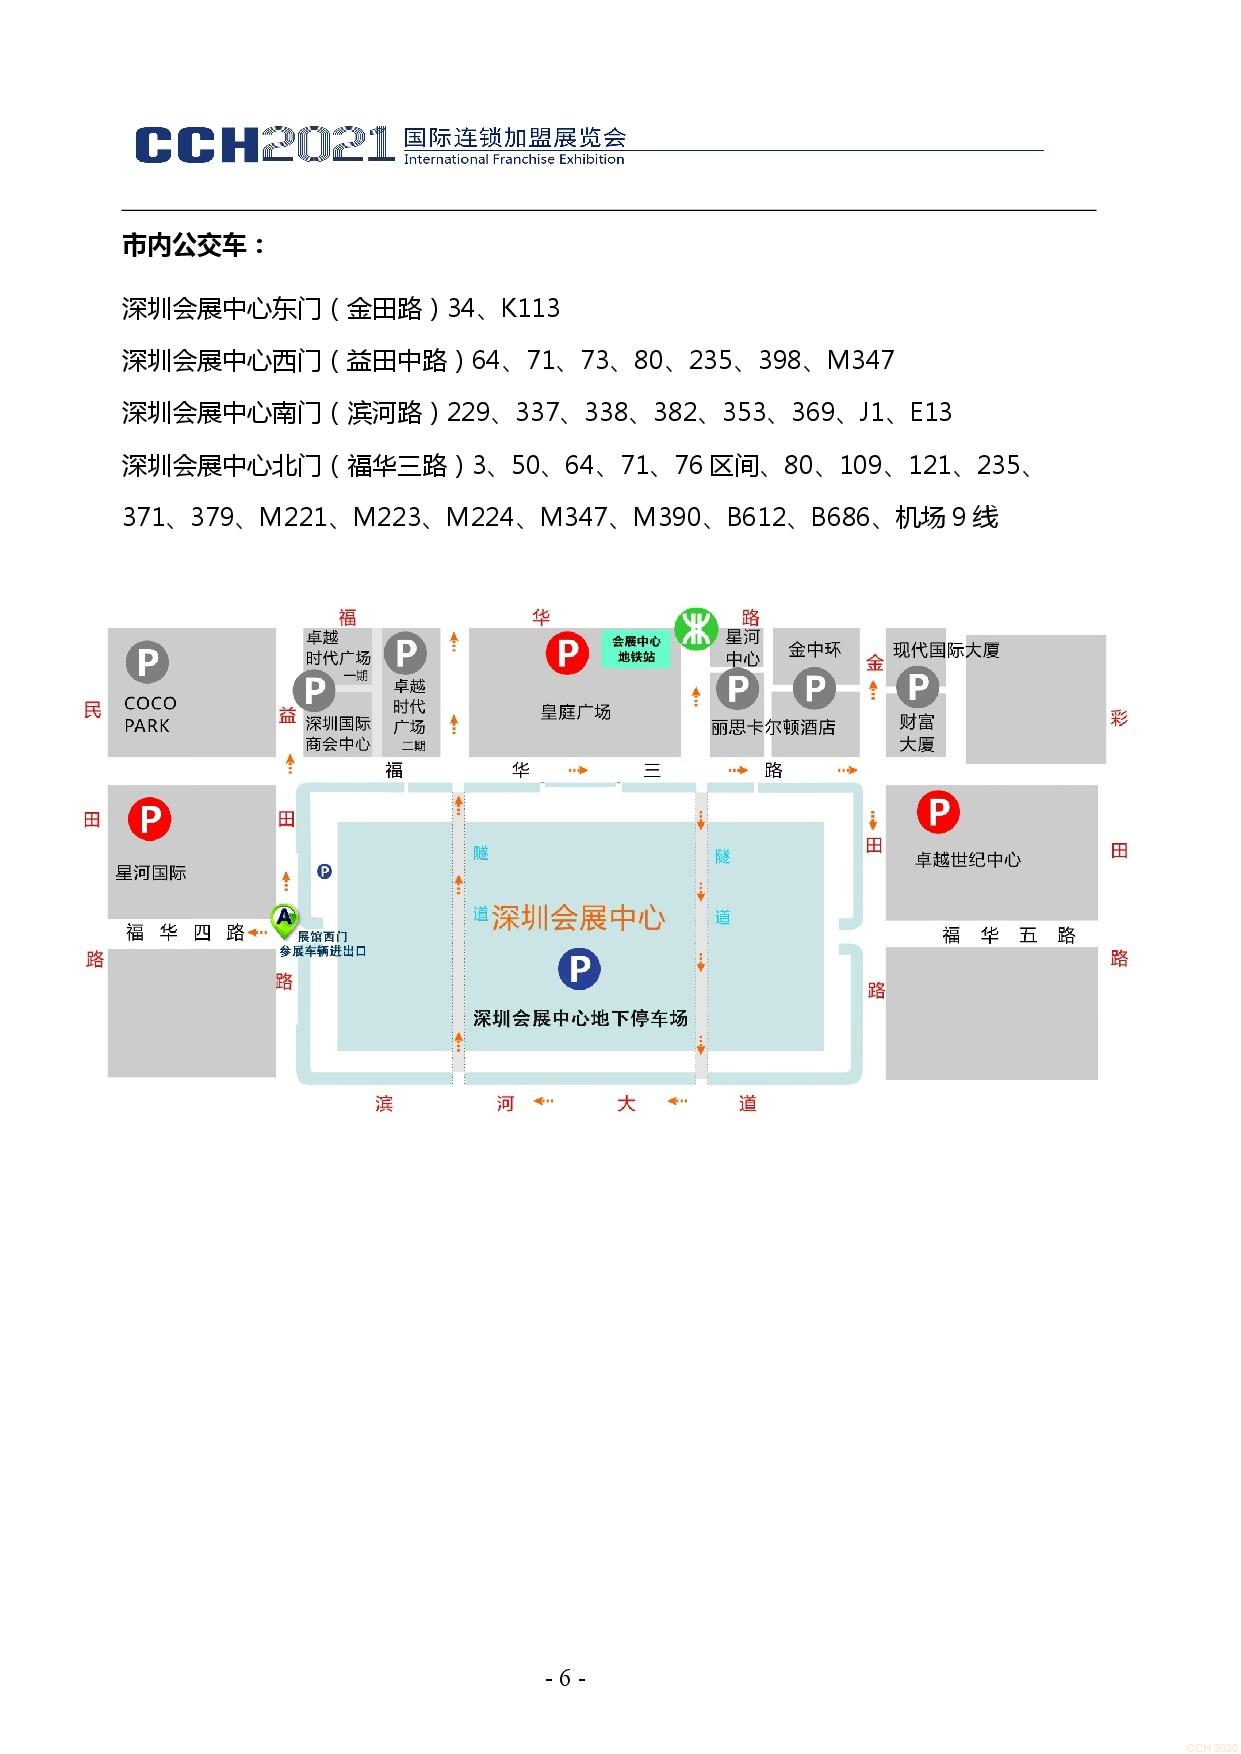 0416CCH深圳展参展商手册4.16-006.jpg